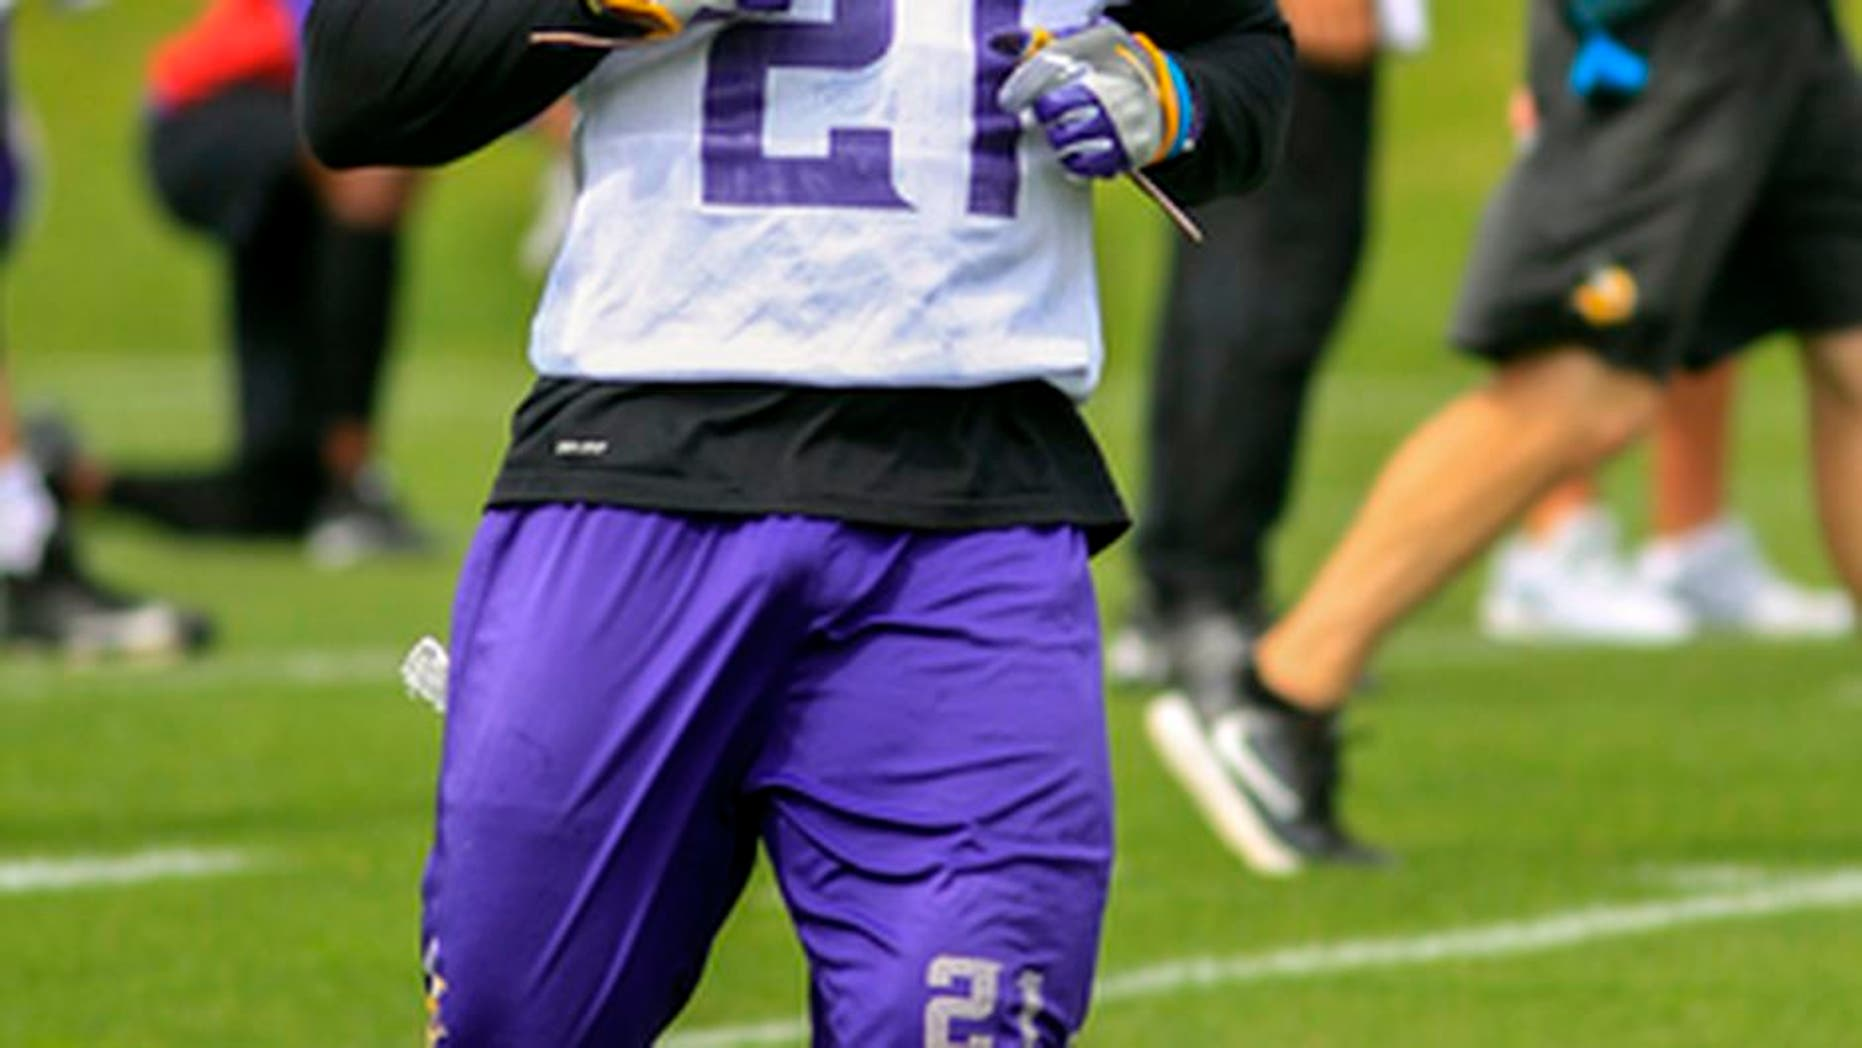 Minnesota Vikings running back Jerick McKinnon runs during NFL football practice Tuesday, June 13, 2017, in Eden Prairie, Minn.(AP Photo/Andy Clayton-King)